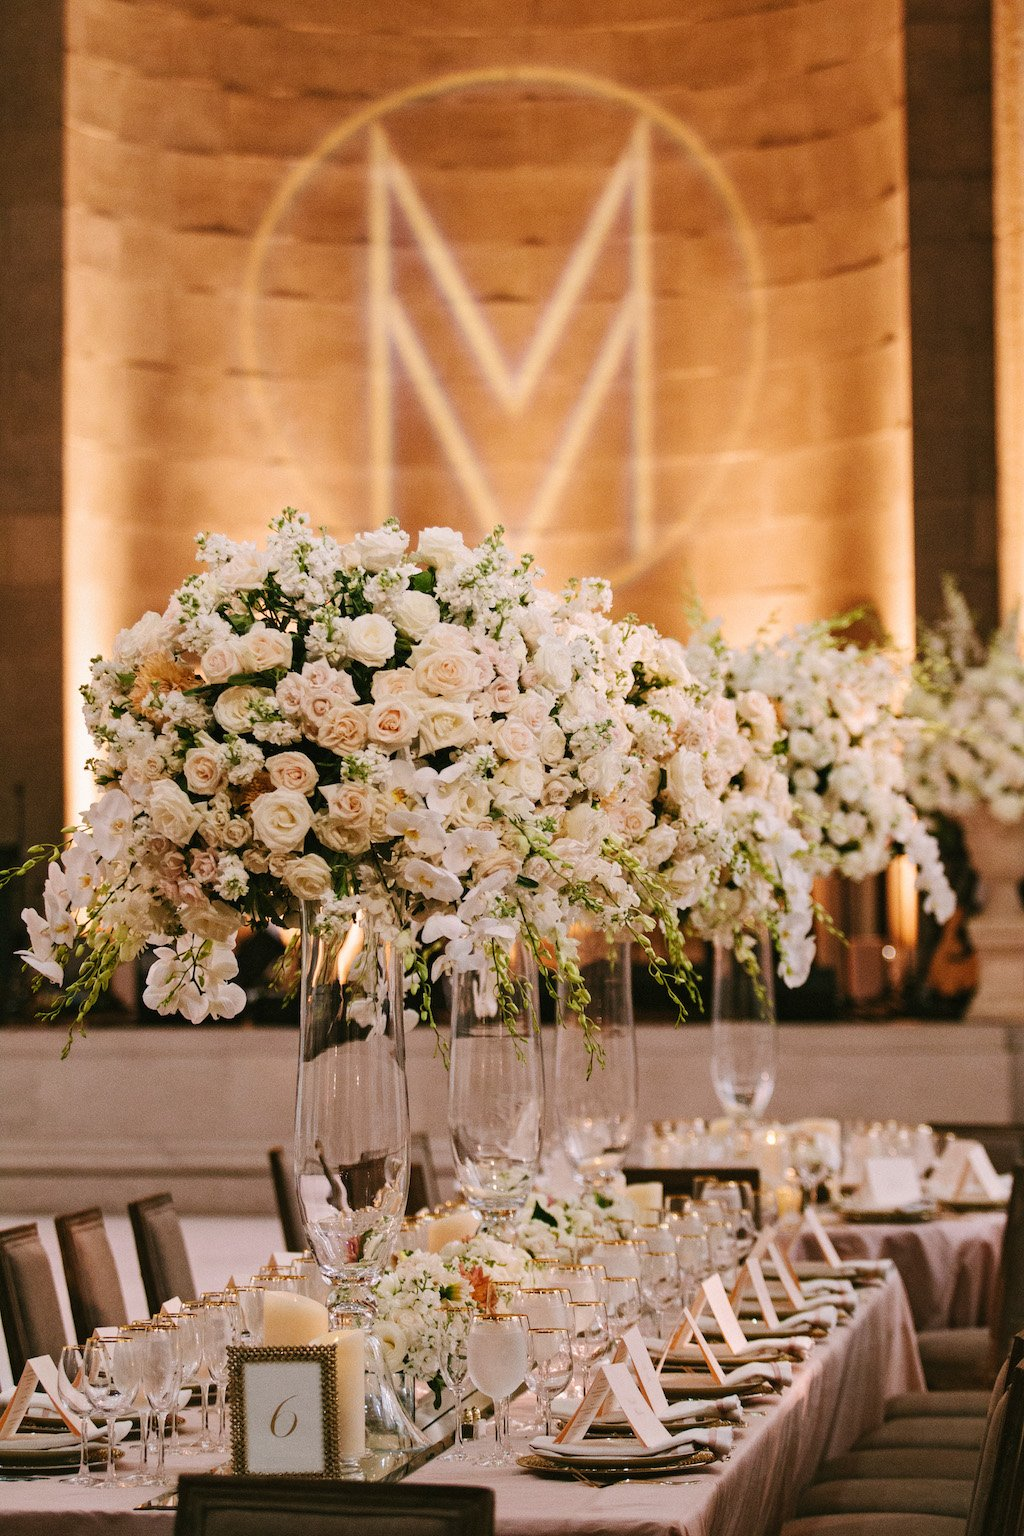 2-8-16-glam-andrew-mellon-gold-wedding-new2